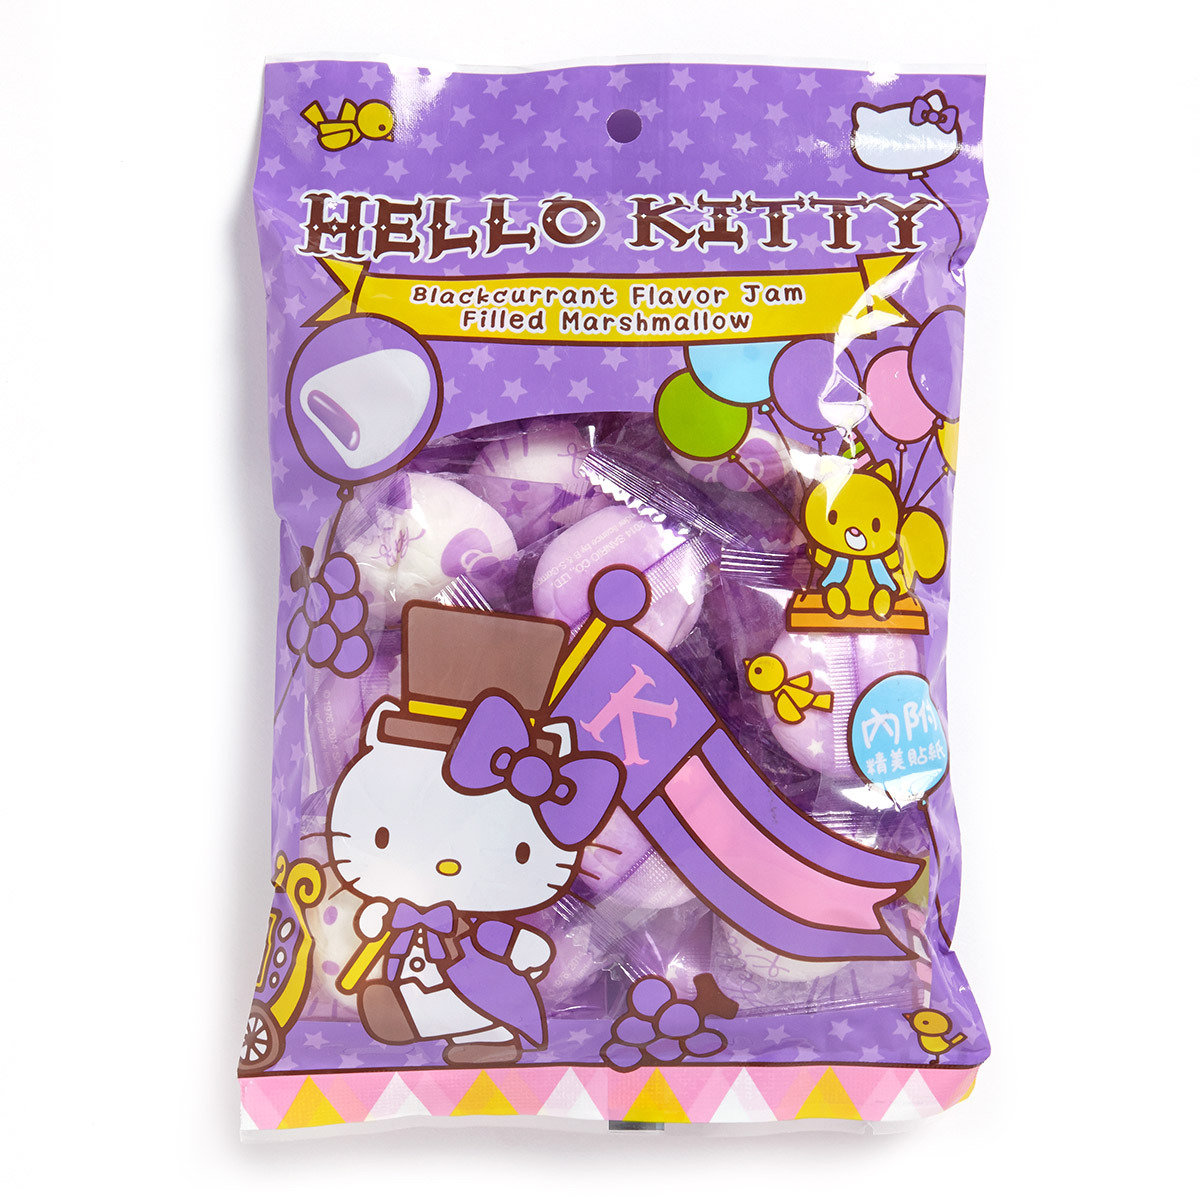 Hello Kitty黑加侖子味夾心棉花糖